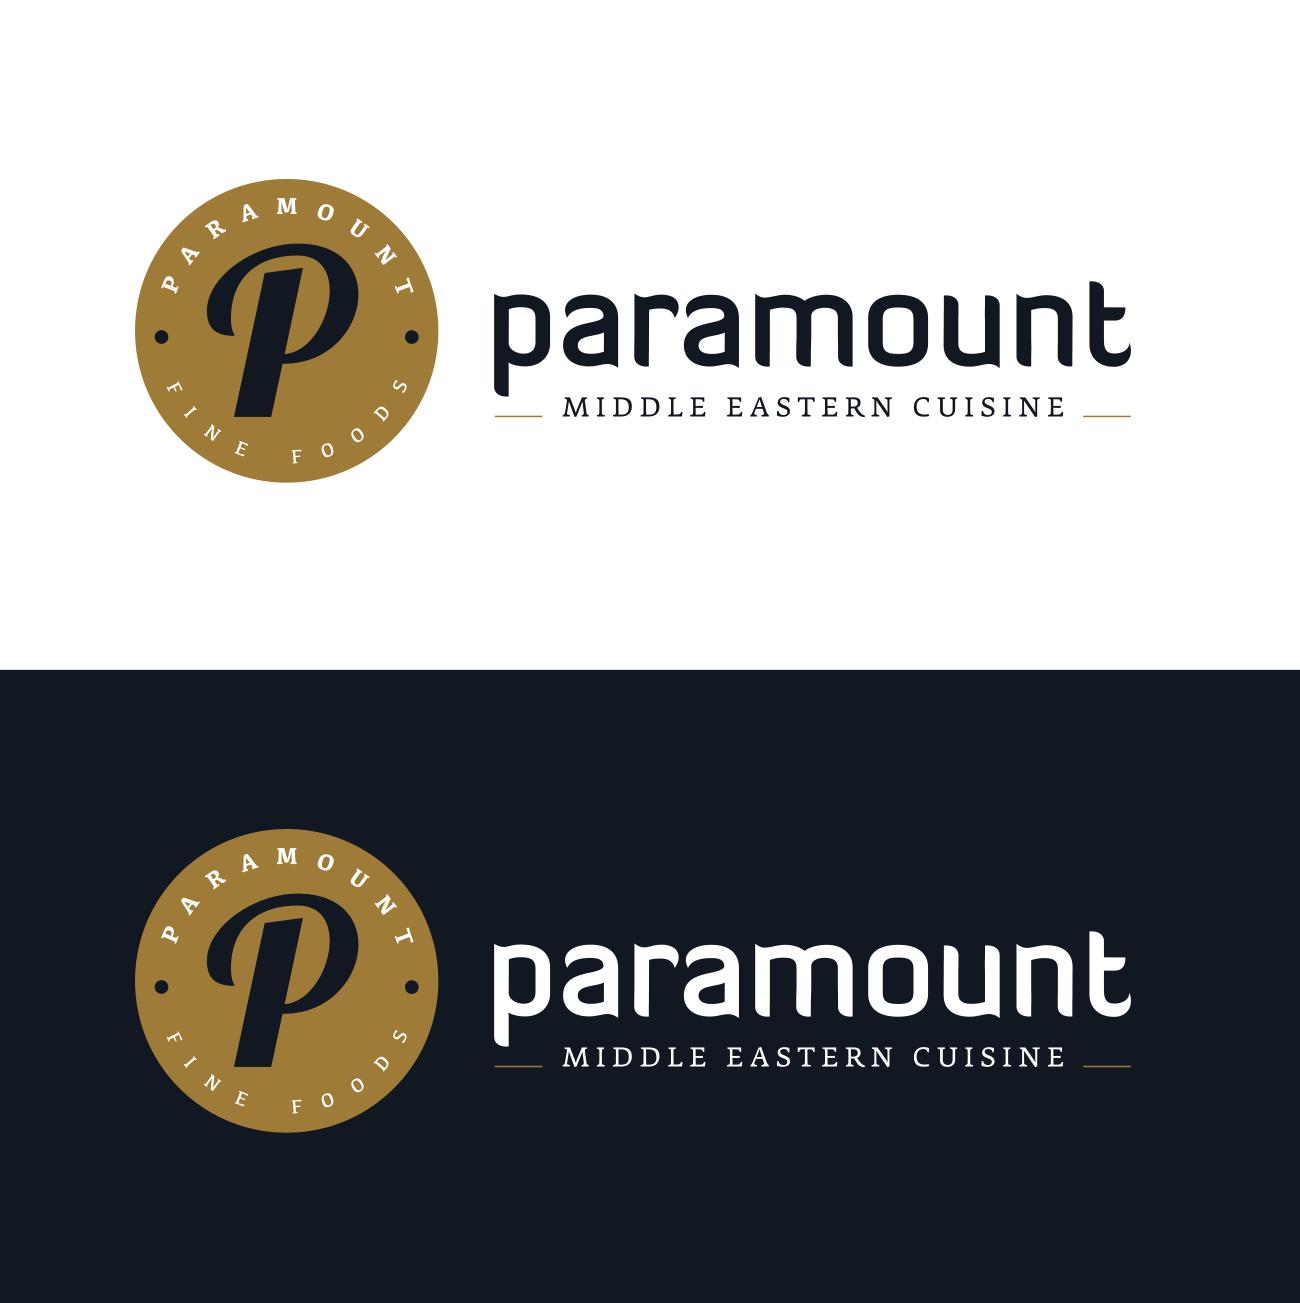 Paramount Fine Foods Rebranding Tarek Atrissi Design The Netherlands